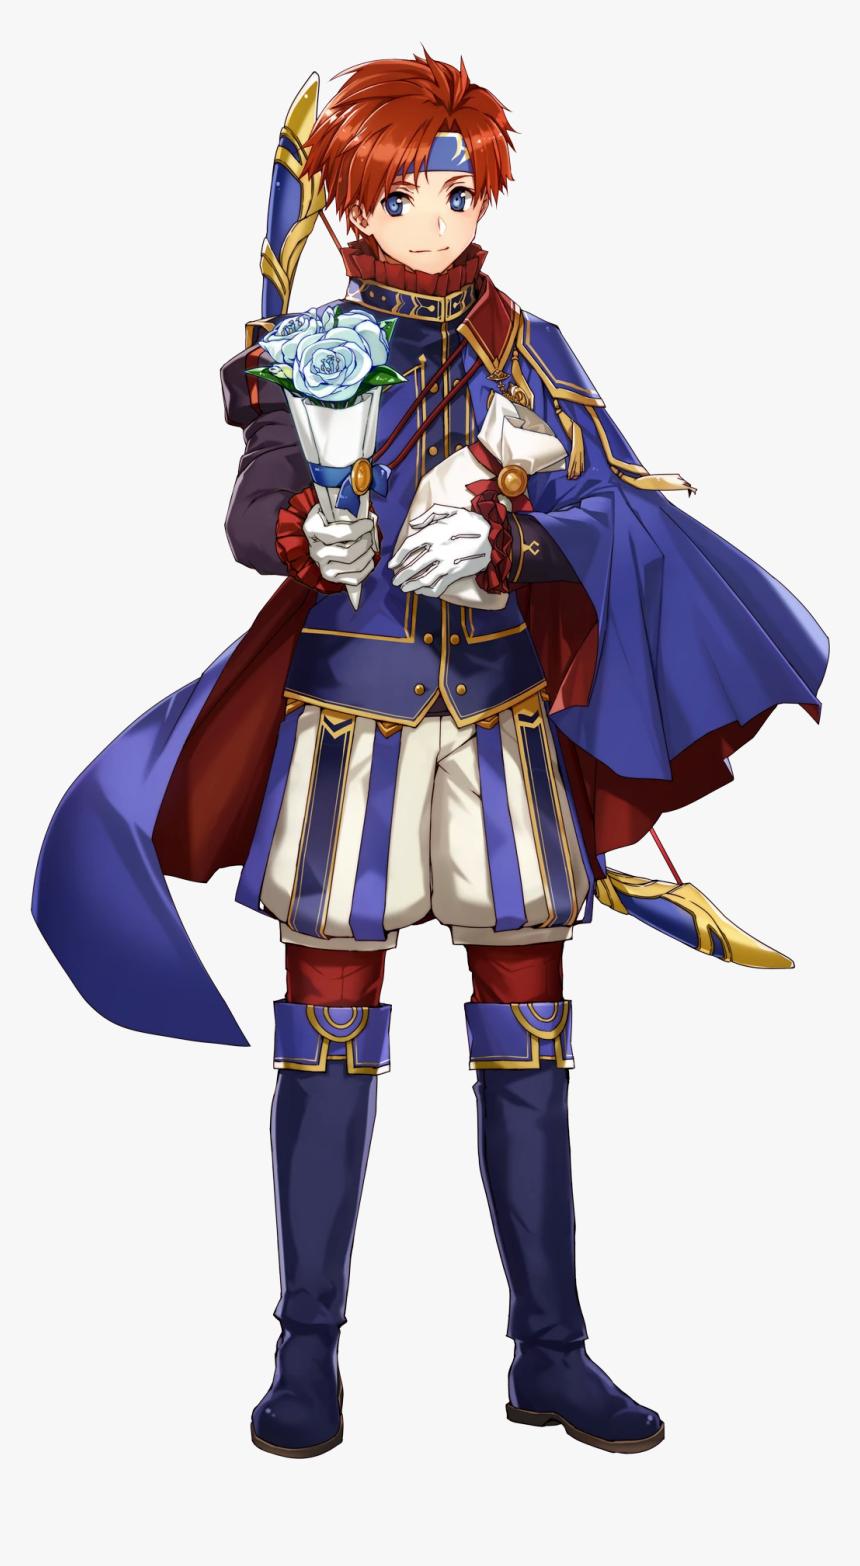 Costume Design Costume Anime - Fire Emblem Heroes La Roy, HD Png Download, Free Download